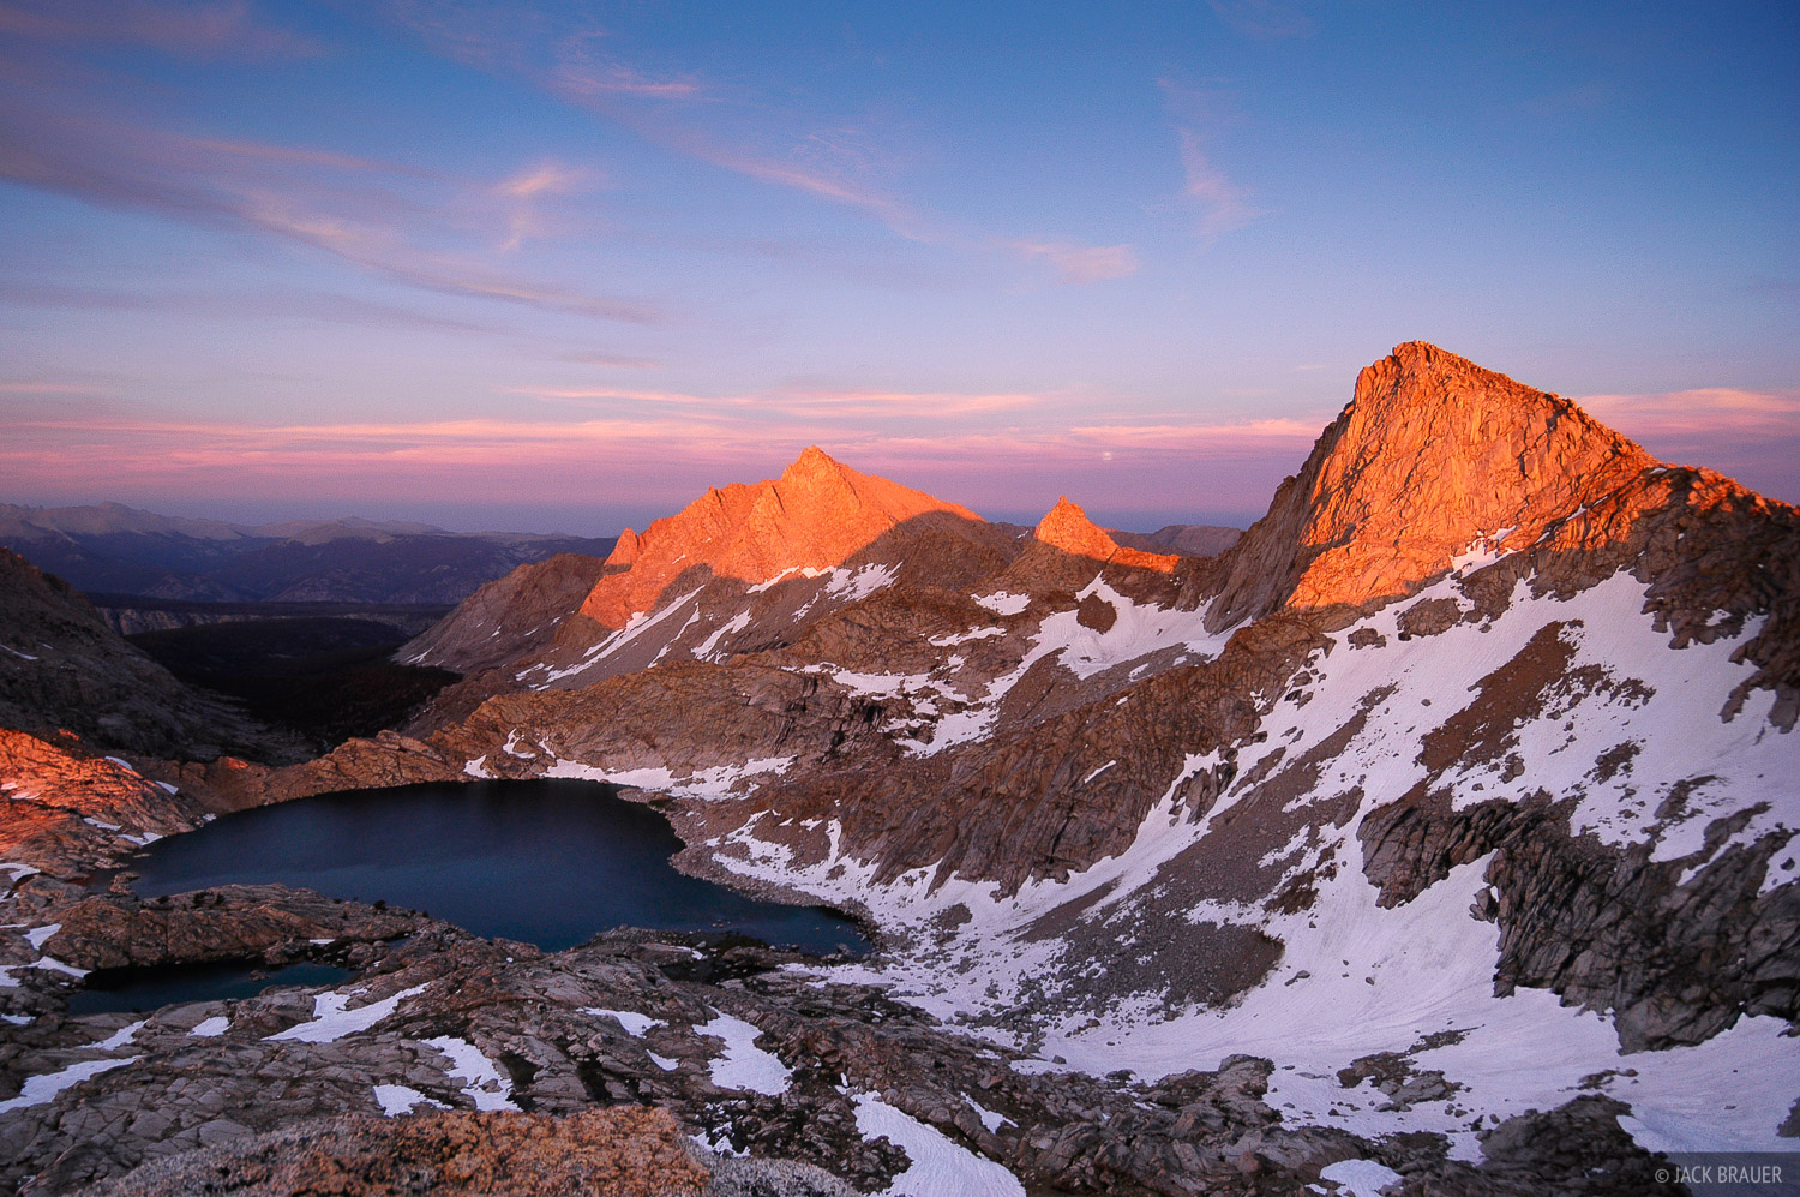 Sawtooth Peak, sunset, Sequoia National Park, Sierra Nevada, California, photo